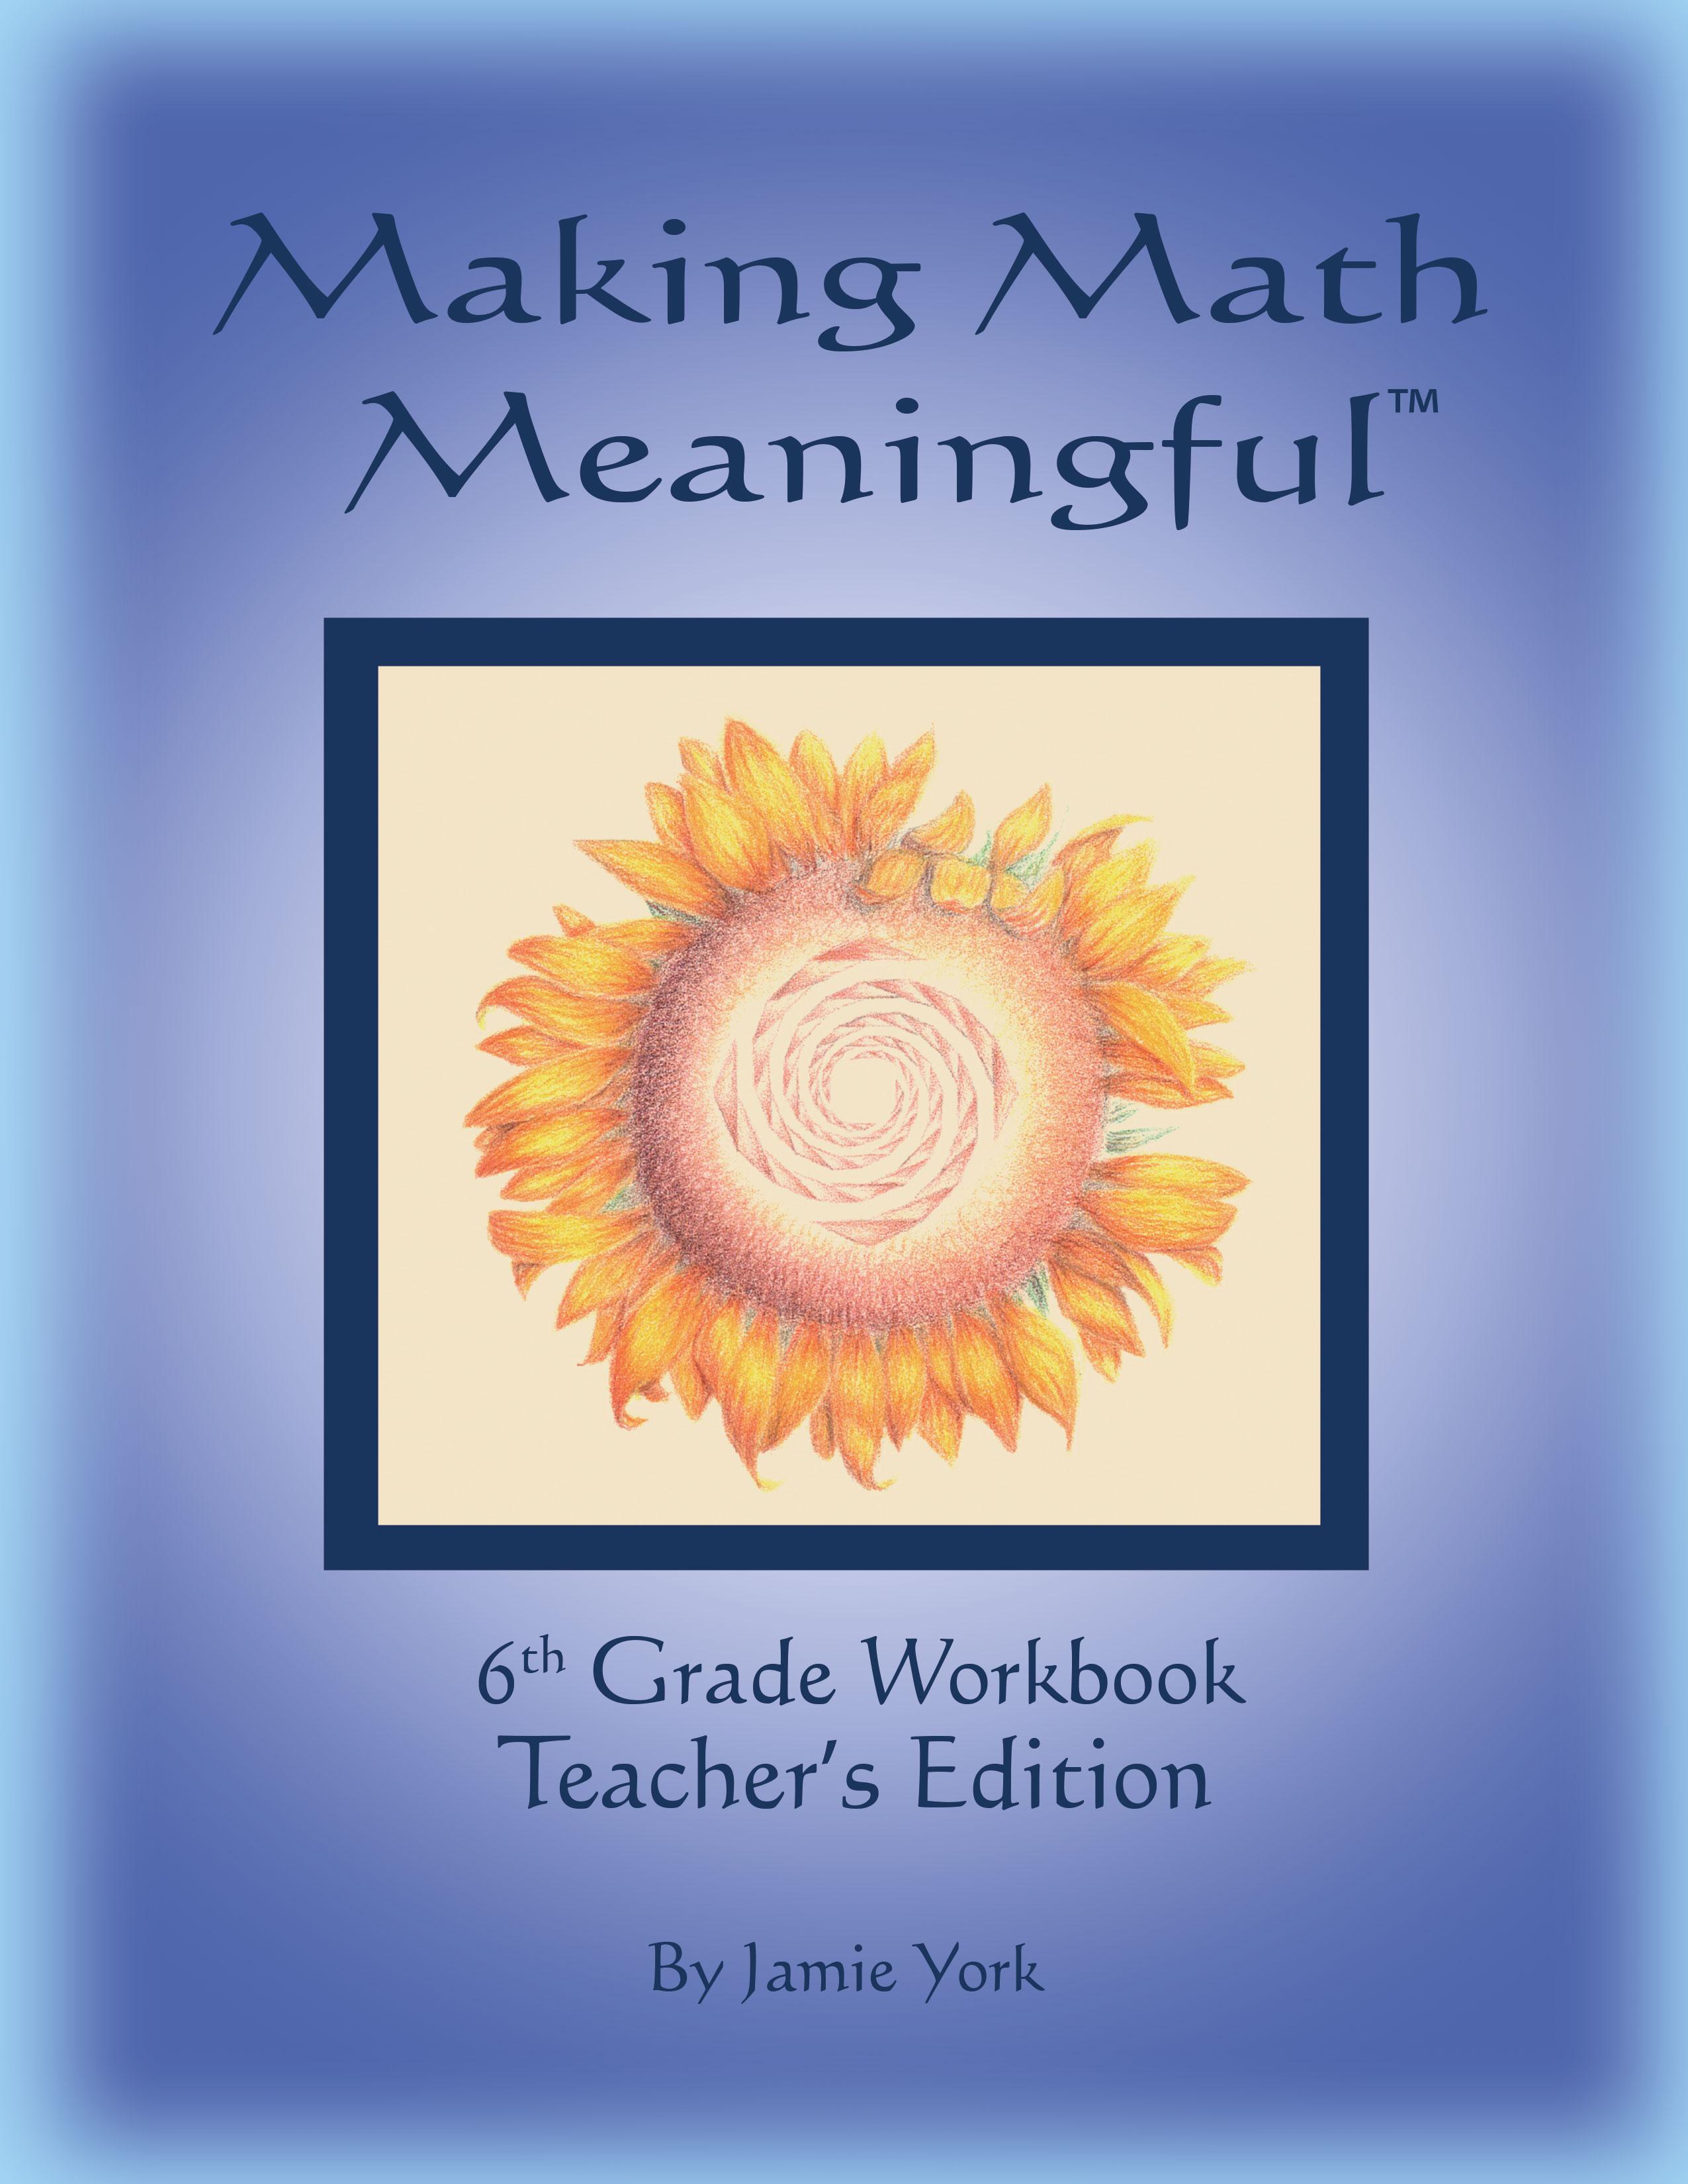 6th Grade Workbook - Teacher's Edition - Jamie York Press